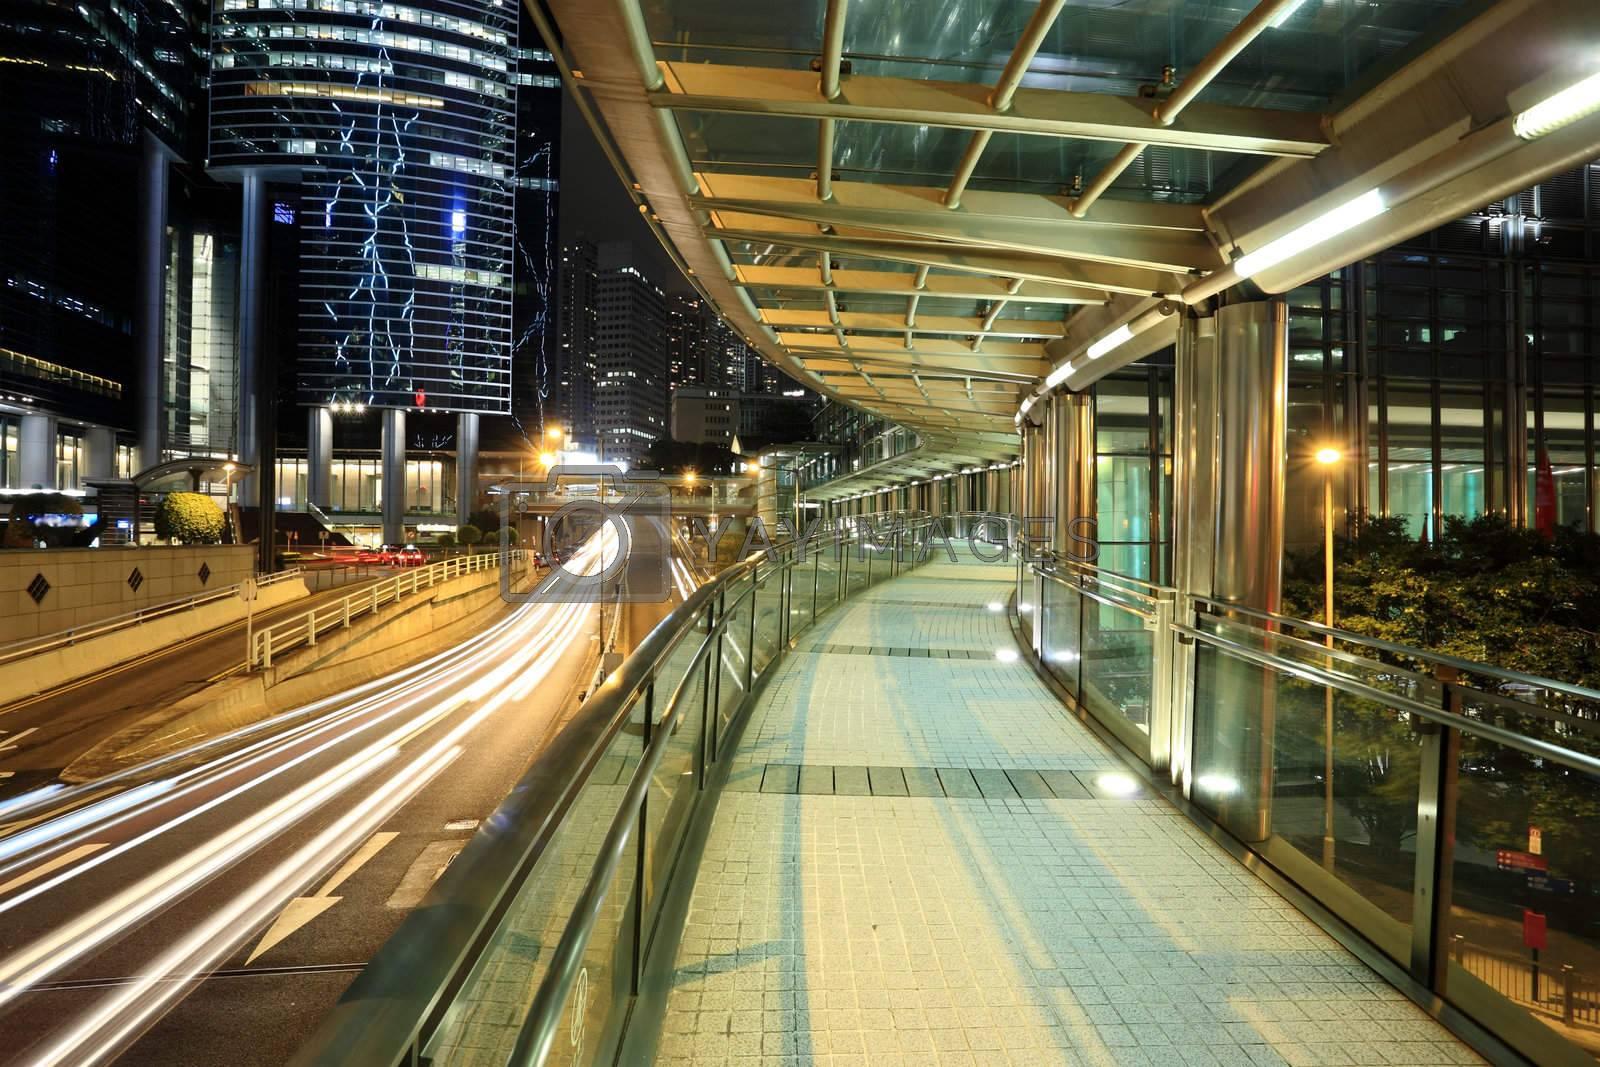 Royalty free image of a modern footbridge at night by leungchopan